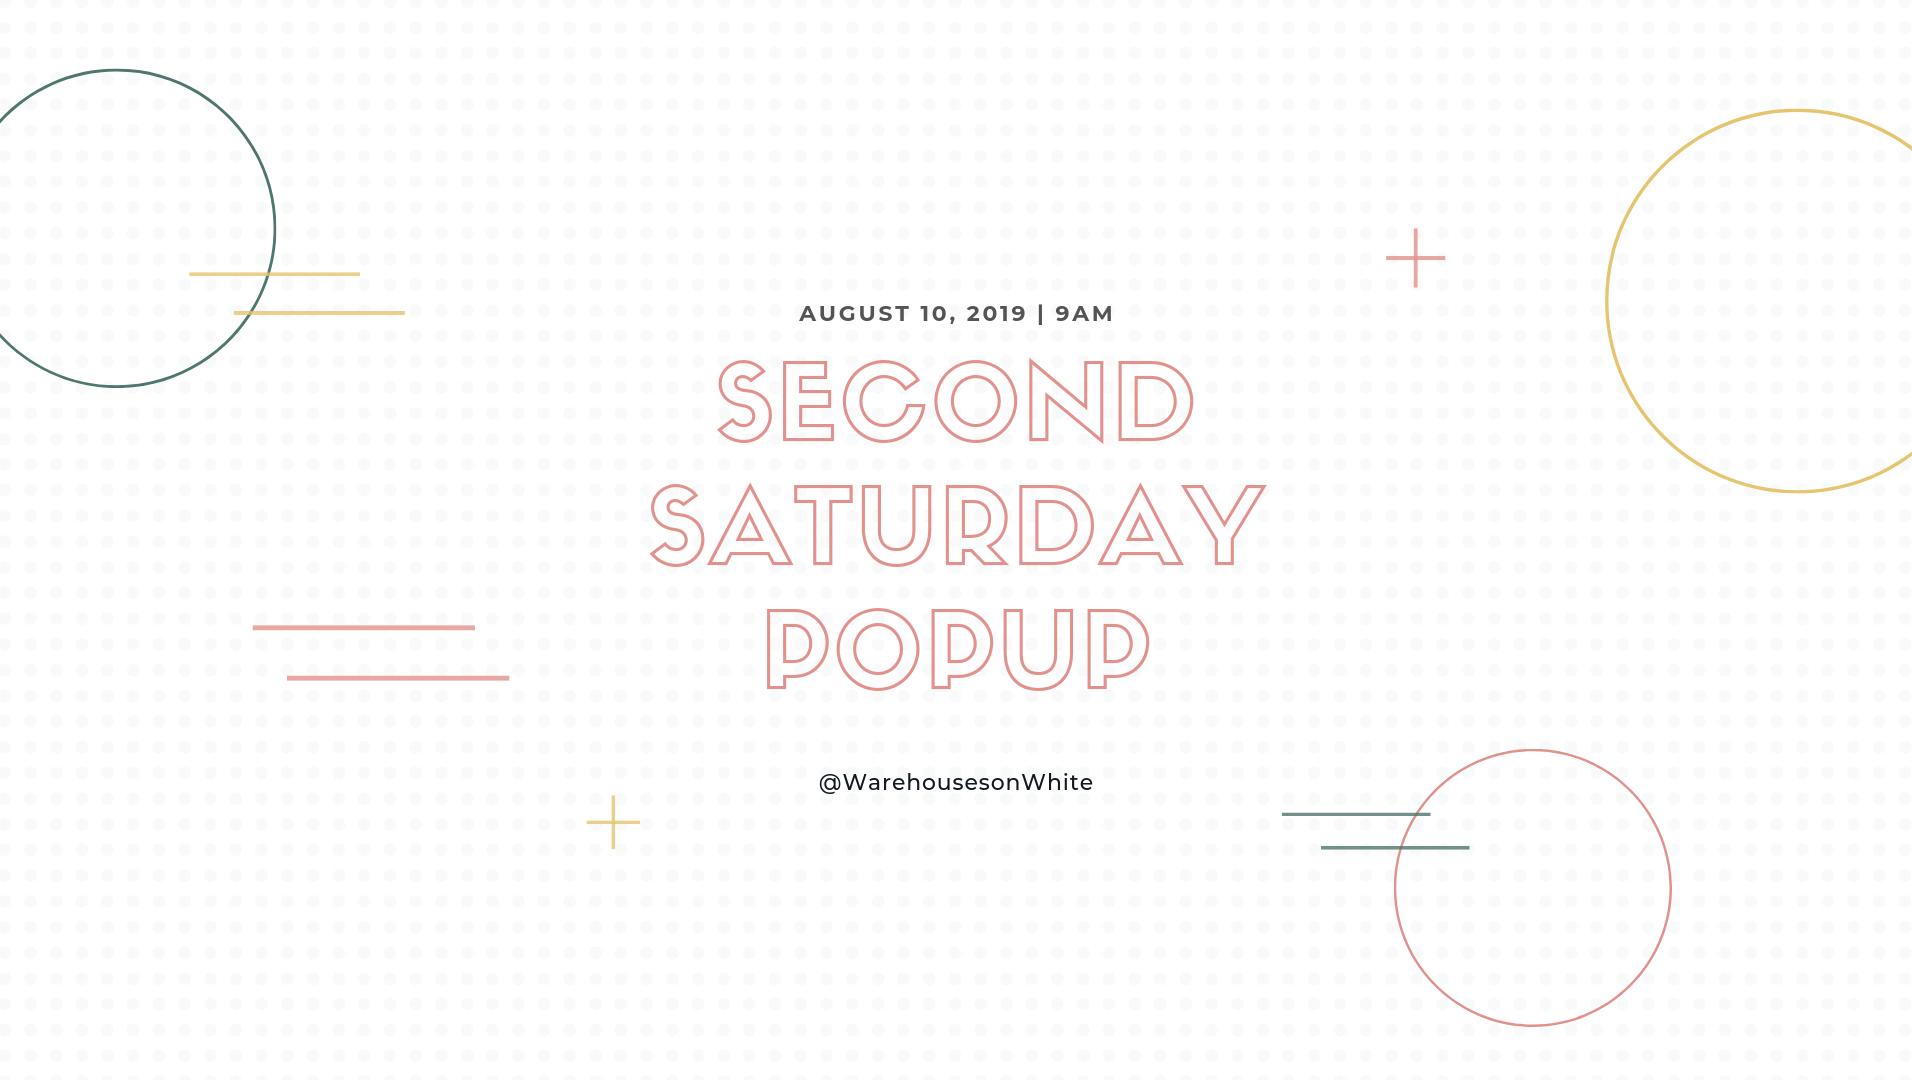 Second Saturday Vendor Pop-Up, August 10th